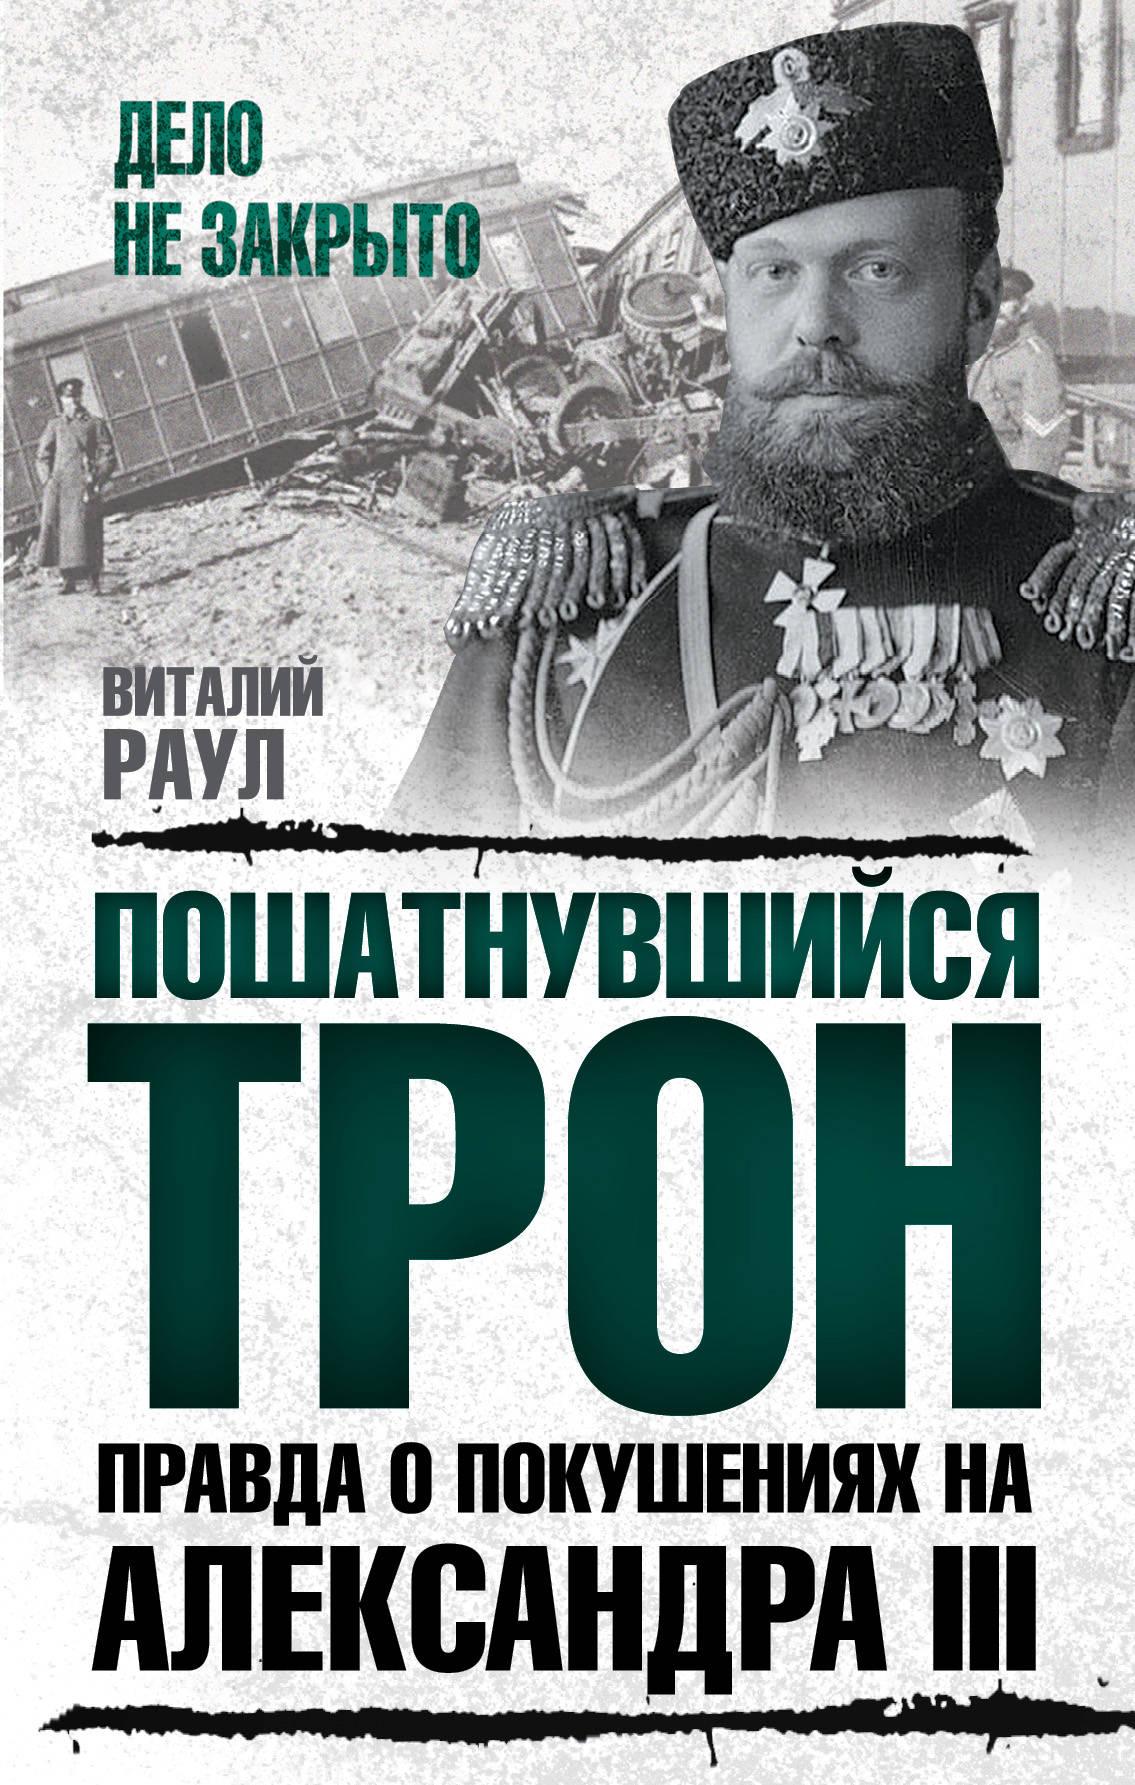 Пошатнувшийся трон. Правда о покушениях на Александра III